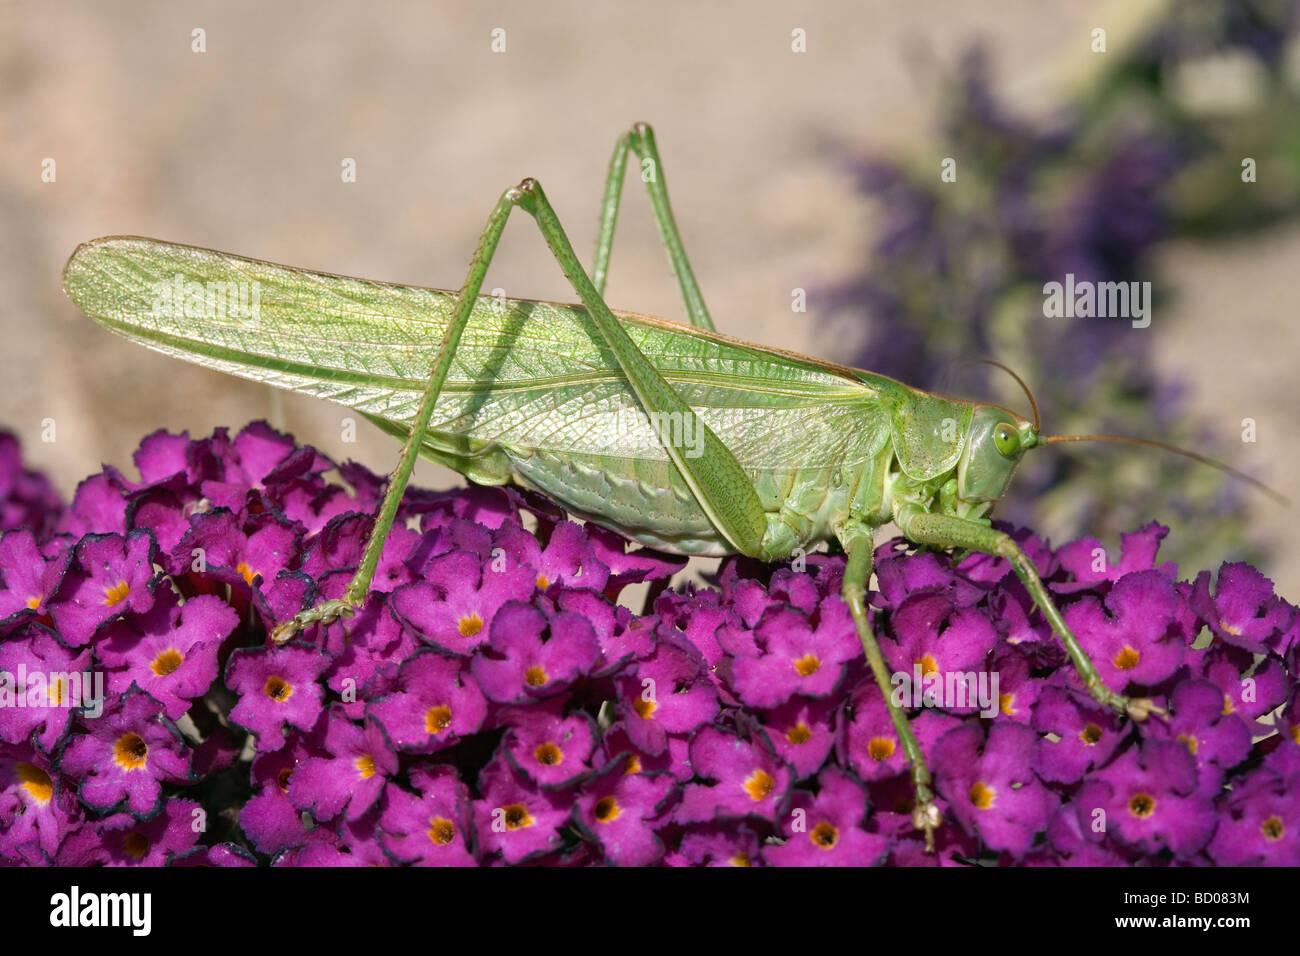 Große grüne Bush Cricket - Tettigonia viridissima Stockbild